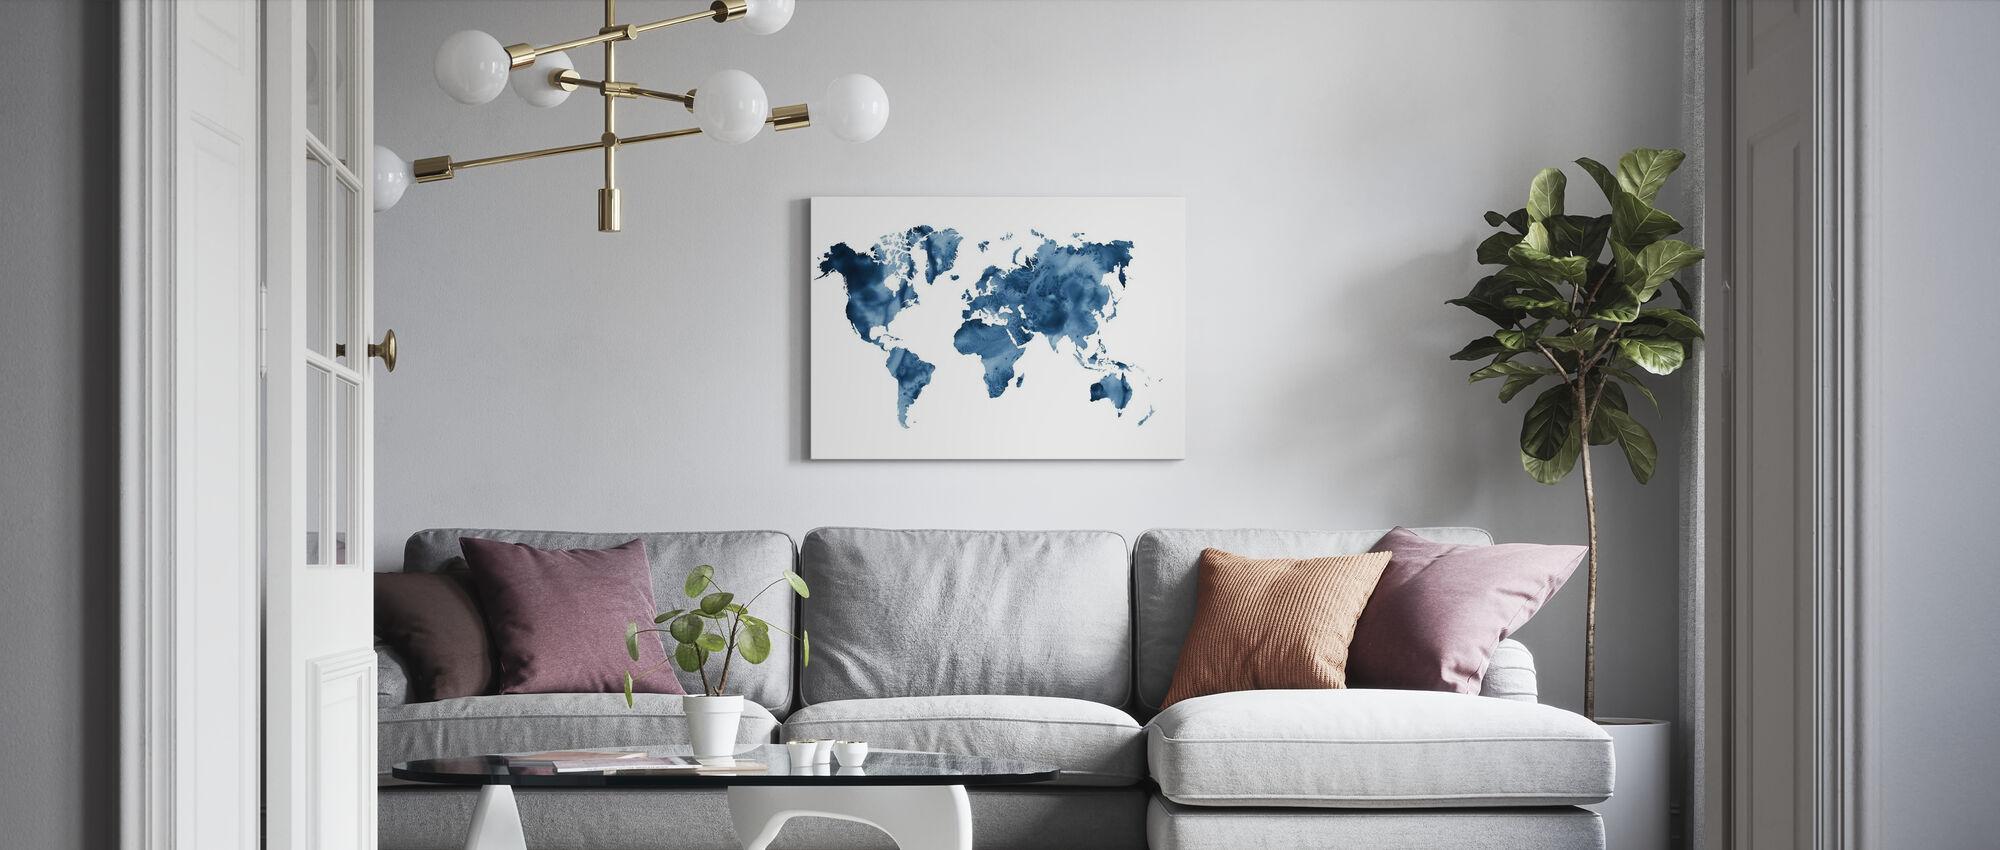 Aquarell Welt Marineblau - Leinwandbild - Wohnzimmer